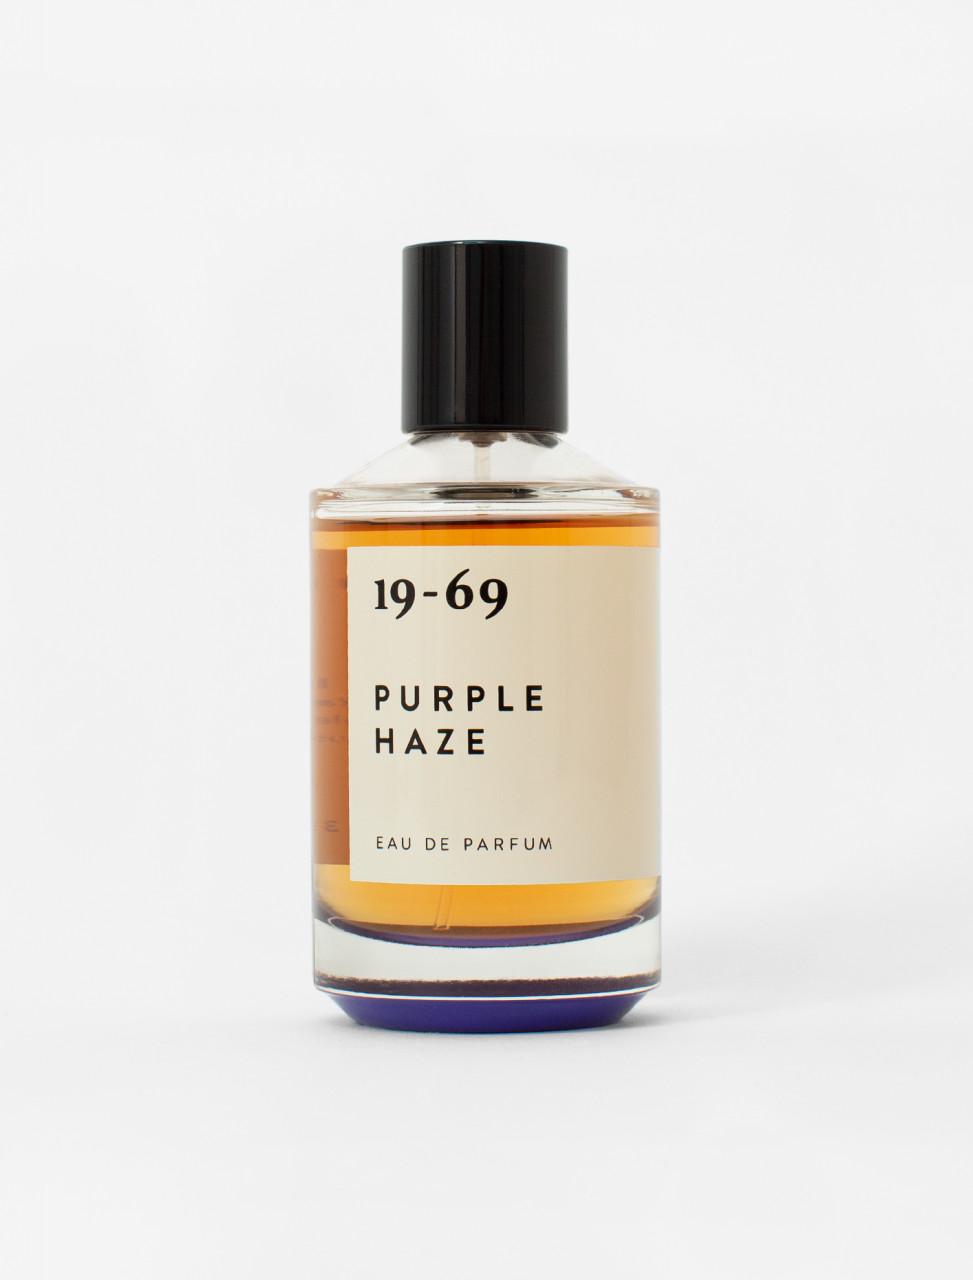 PURPLE HAZE Eau de Parfum 100 ml